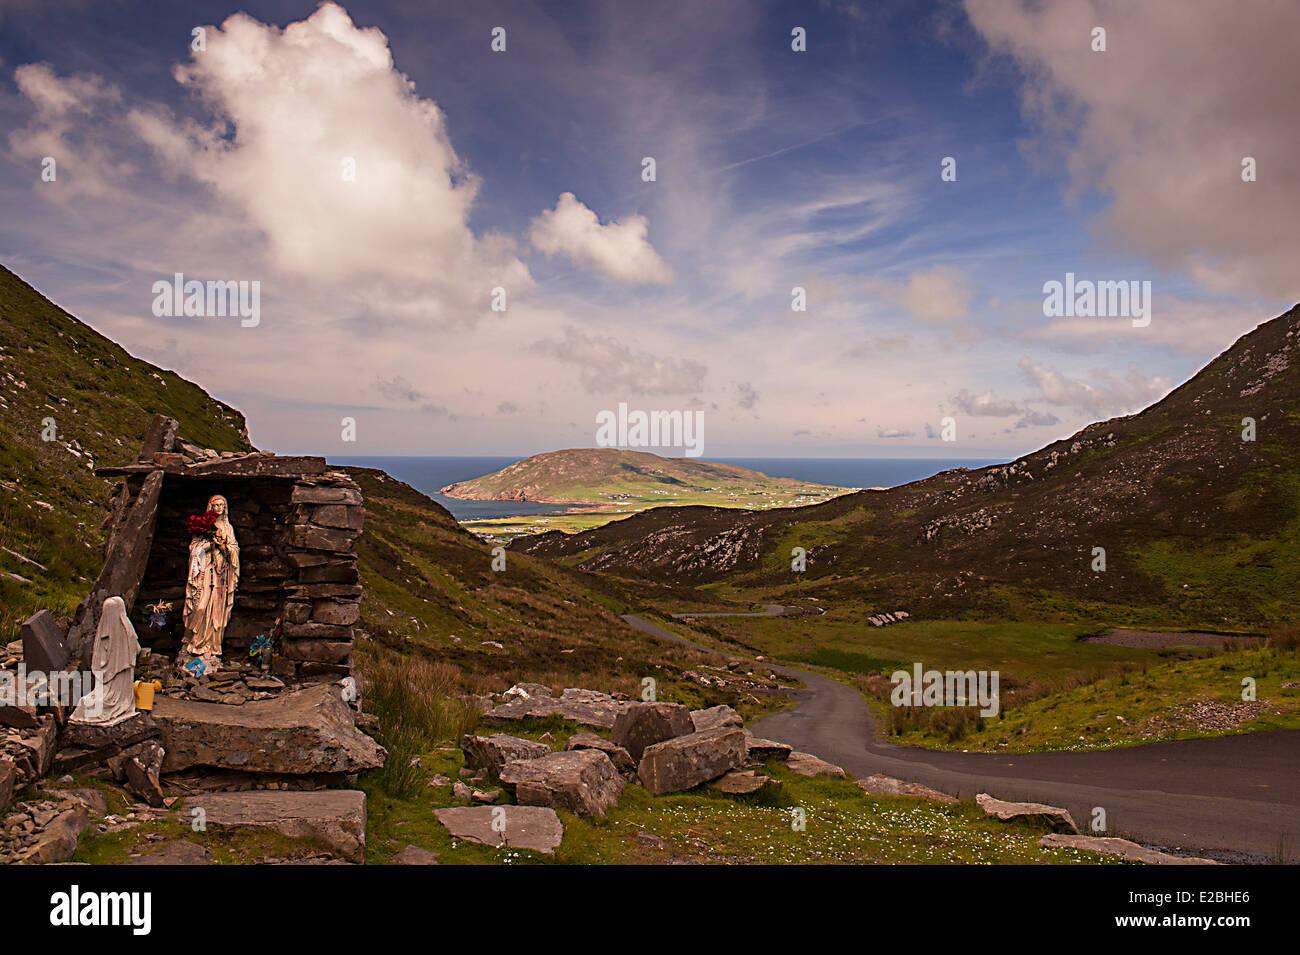 Religious shrine and St Columbas holy well at Mamore Gap, Urris Hills, Inishowen Peninsula, County Donegal, Ireland, - Stock Image